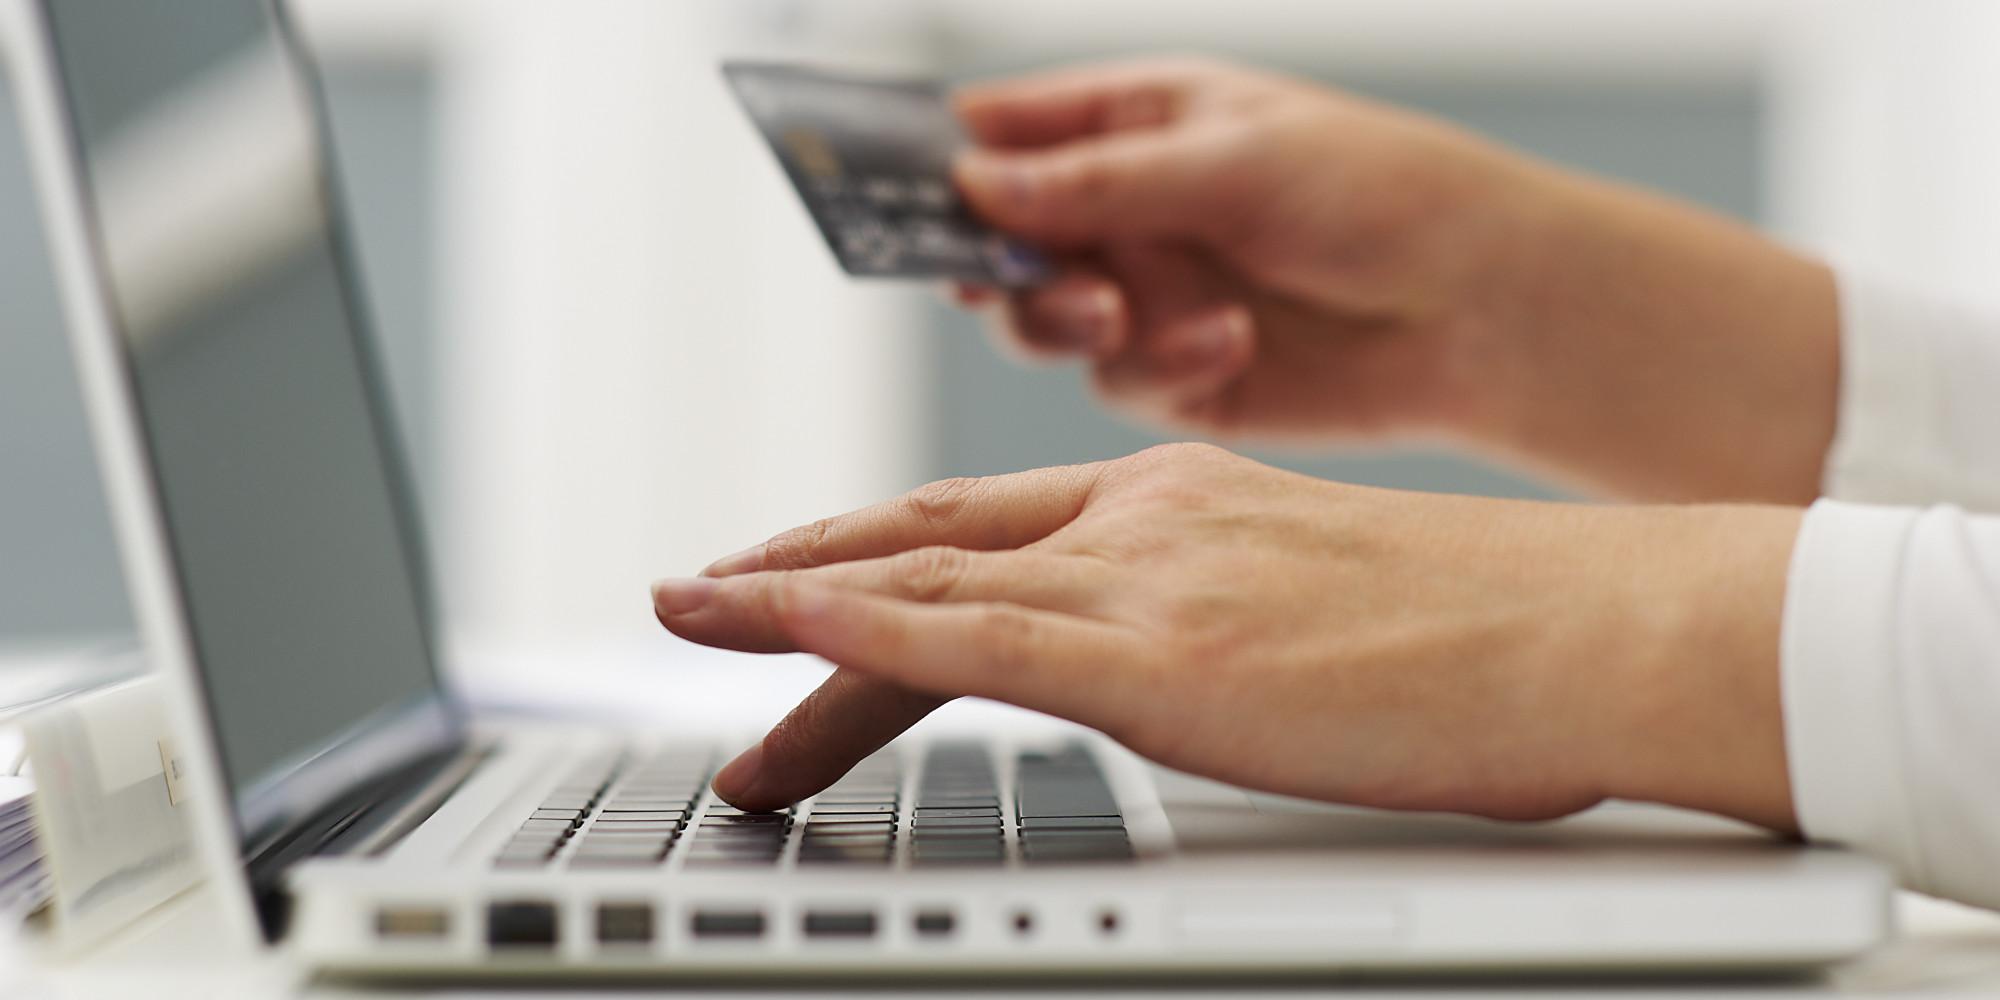 achat en ligne fait perdre millions dollars n